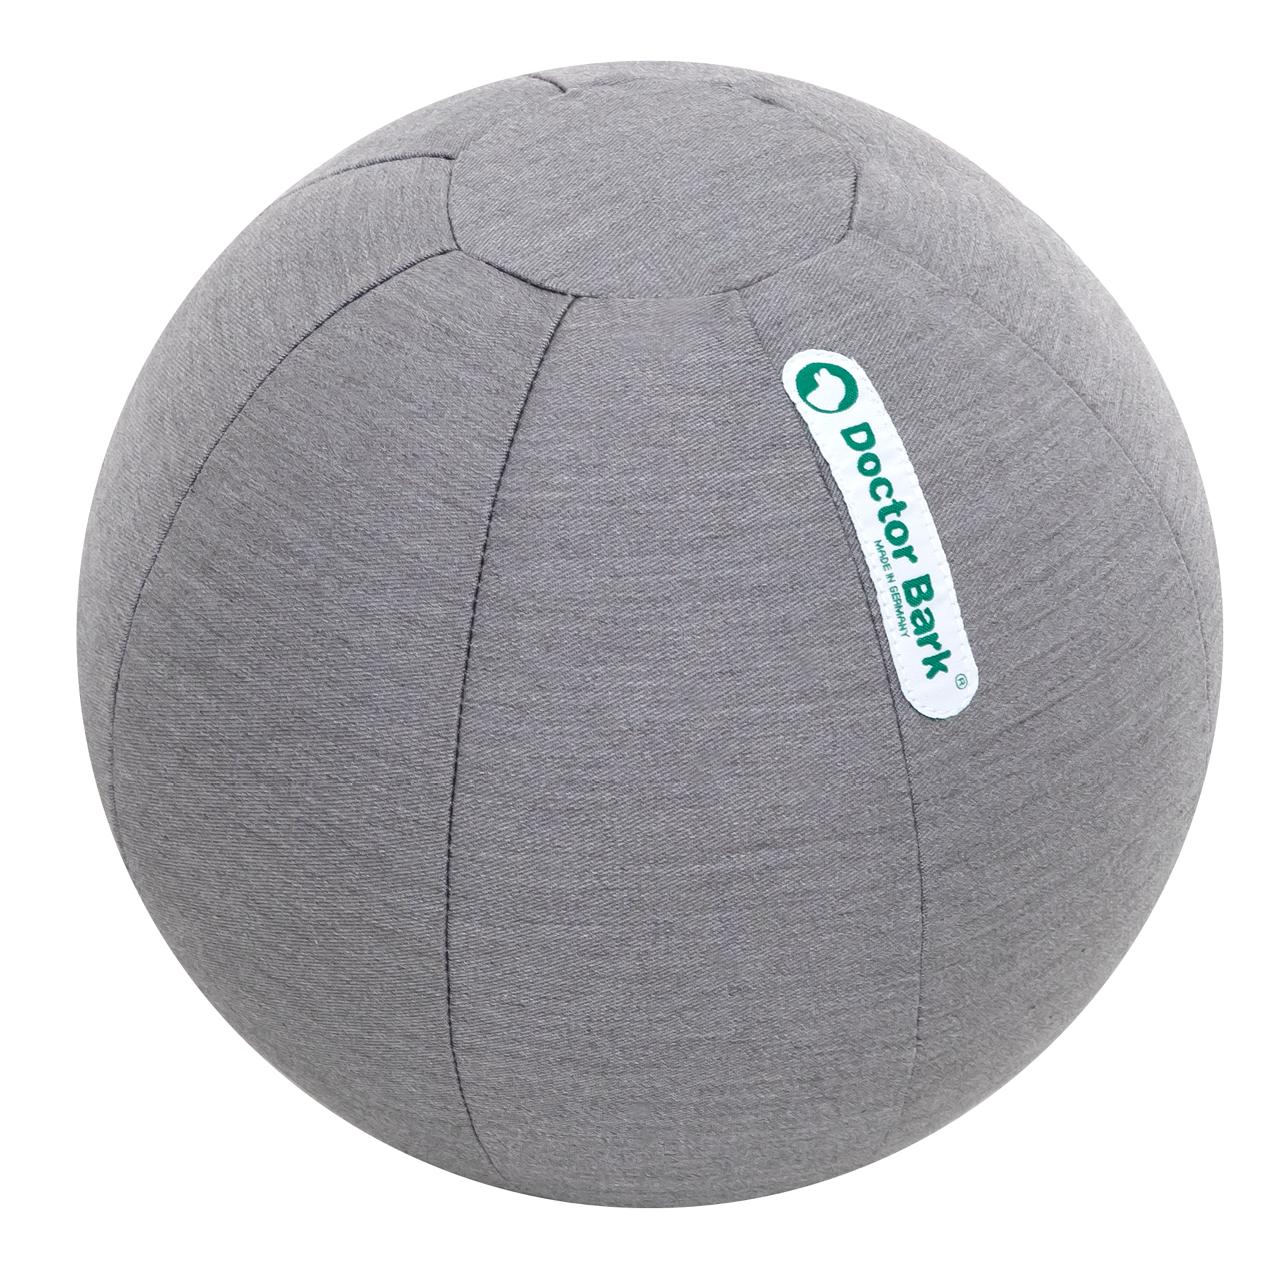 Toy Ball hellgrau